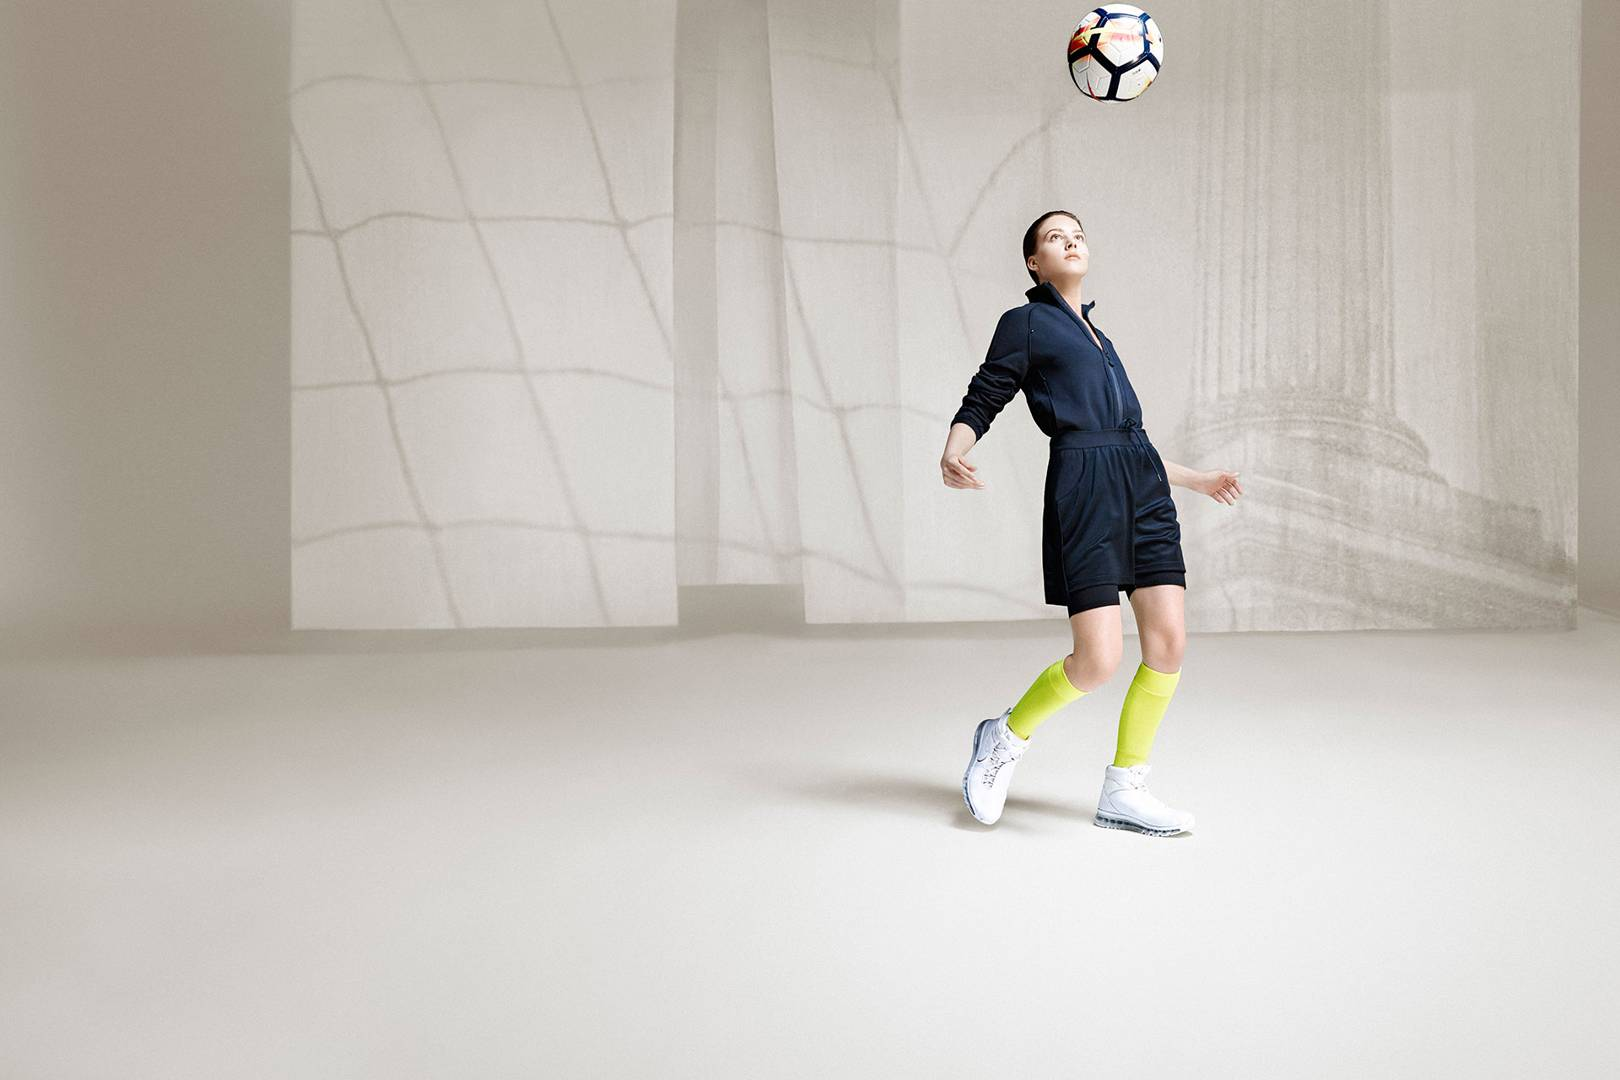 cd5a2b3dfe00 Designer Kim Jones On His Football-Inspired NikeLab Collaboration ...